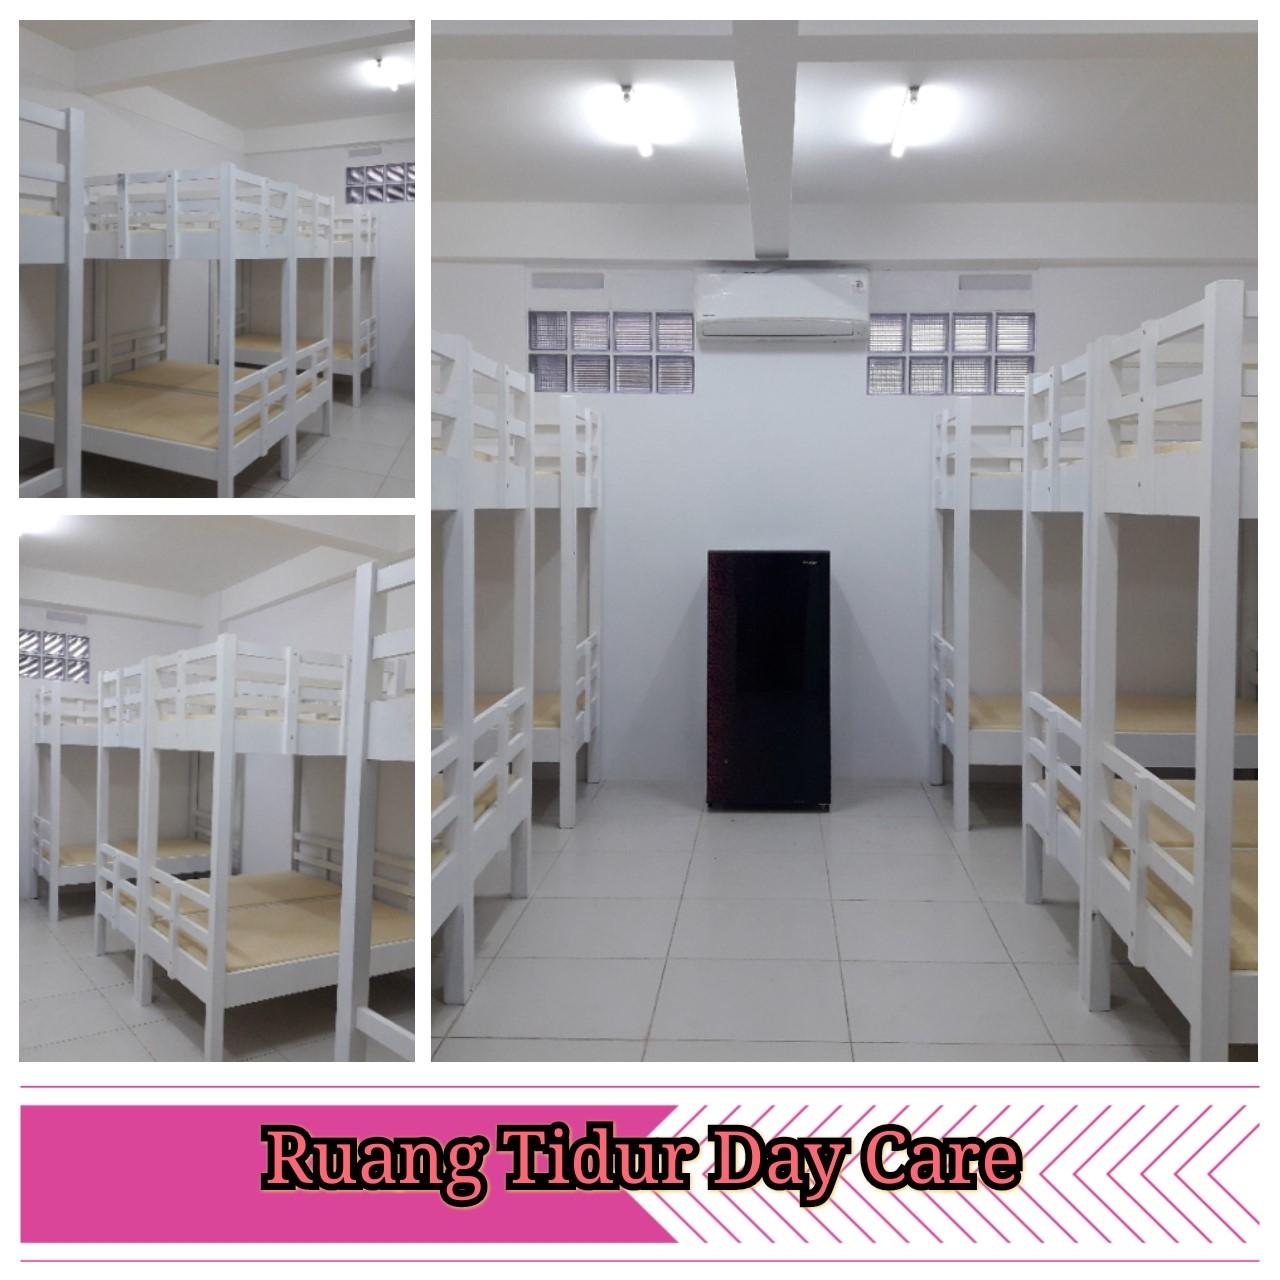 Ruang Tidur Day care